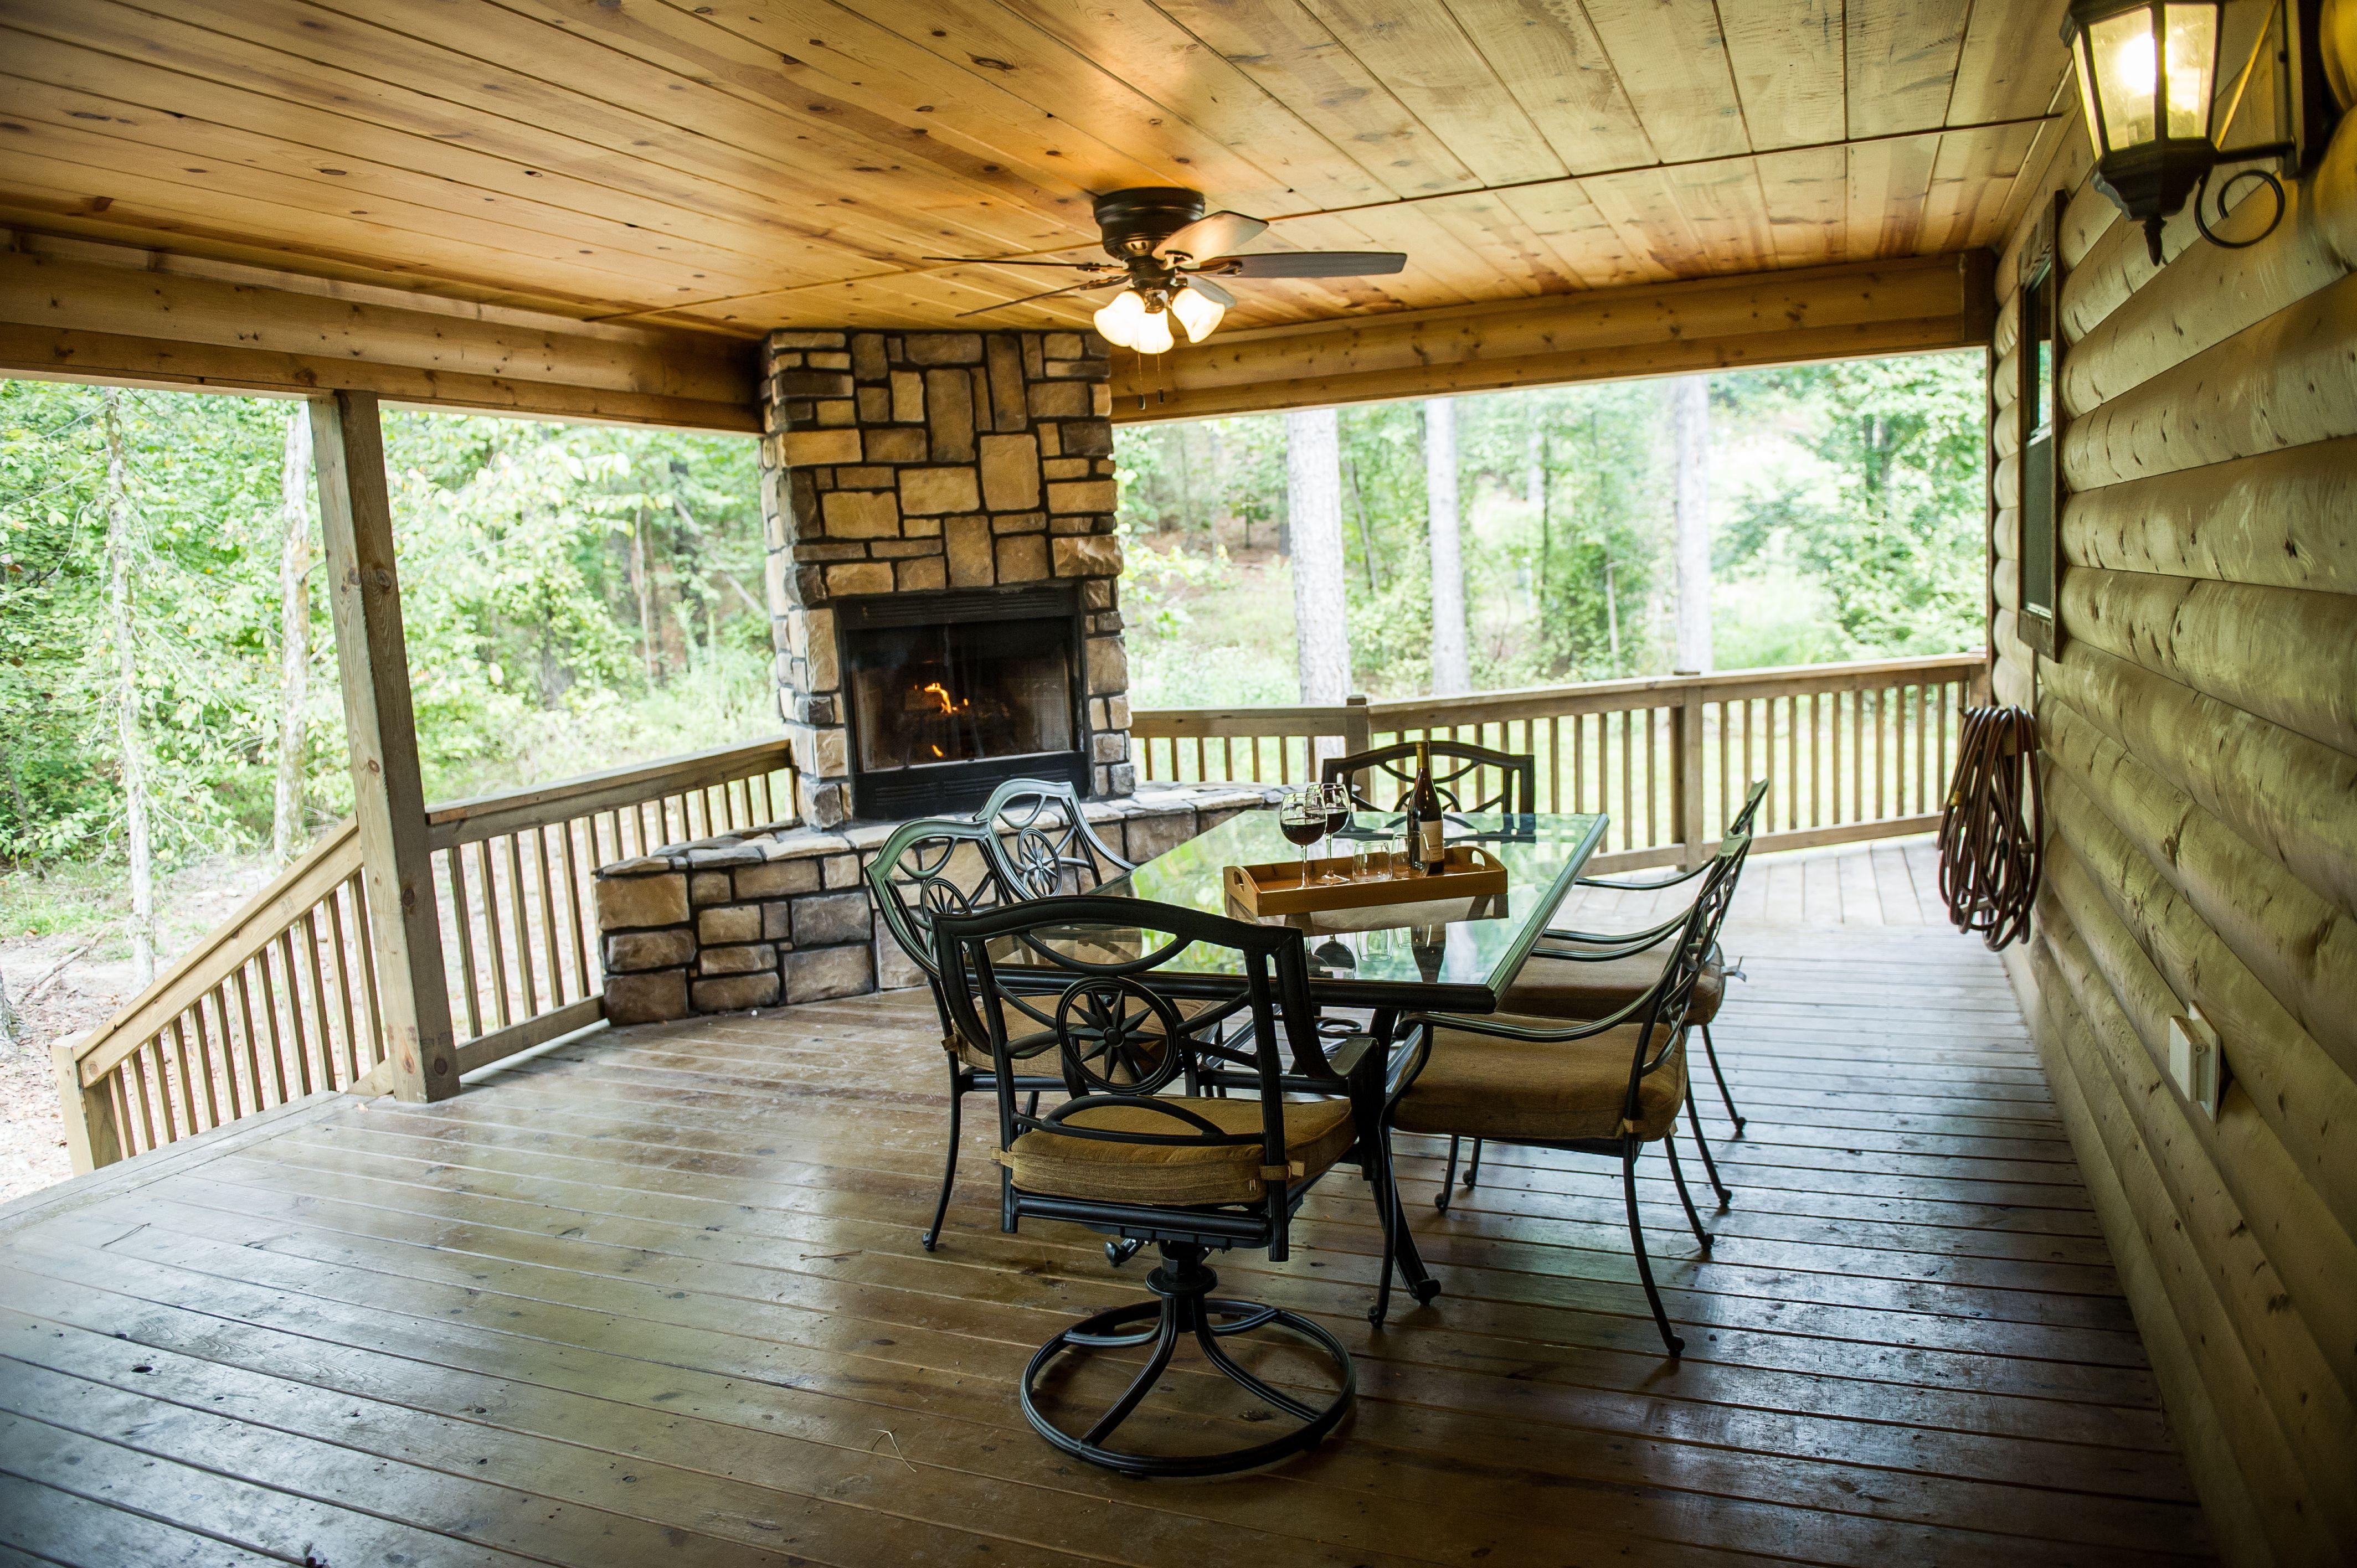 Hearthstone Lodge Beautiful 3 Bedroom 2 Bath Luxury Cabin Nestled In The Beavers Bend Ok Area Near Broken Bo Indoor Gas Fireplace Large Hot Tub Luxury Cabin